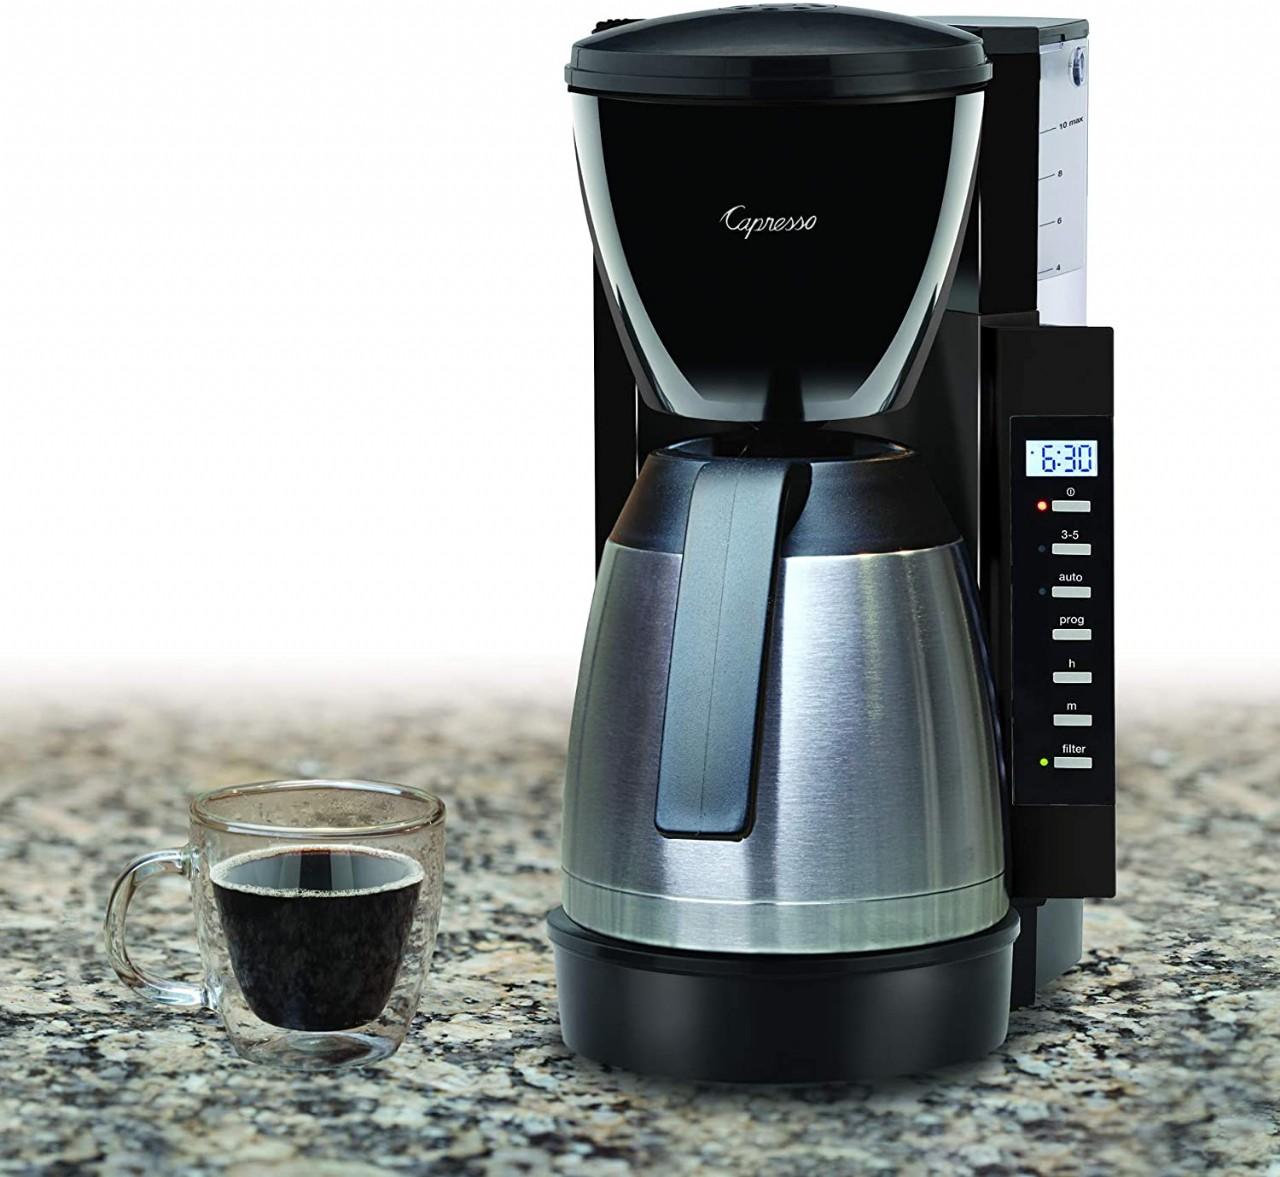 Capresso CM300 Coffee Maker, 10 cup, Black